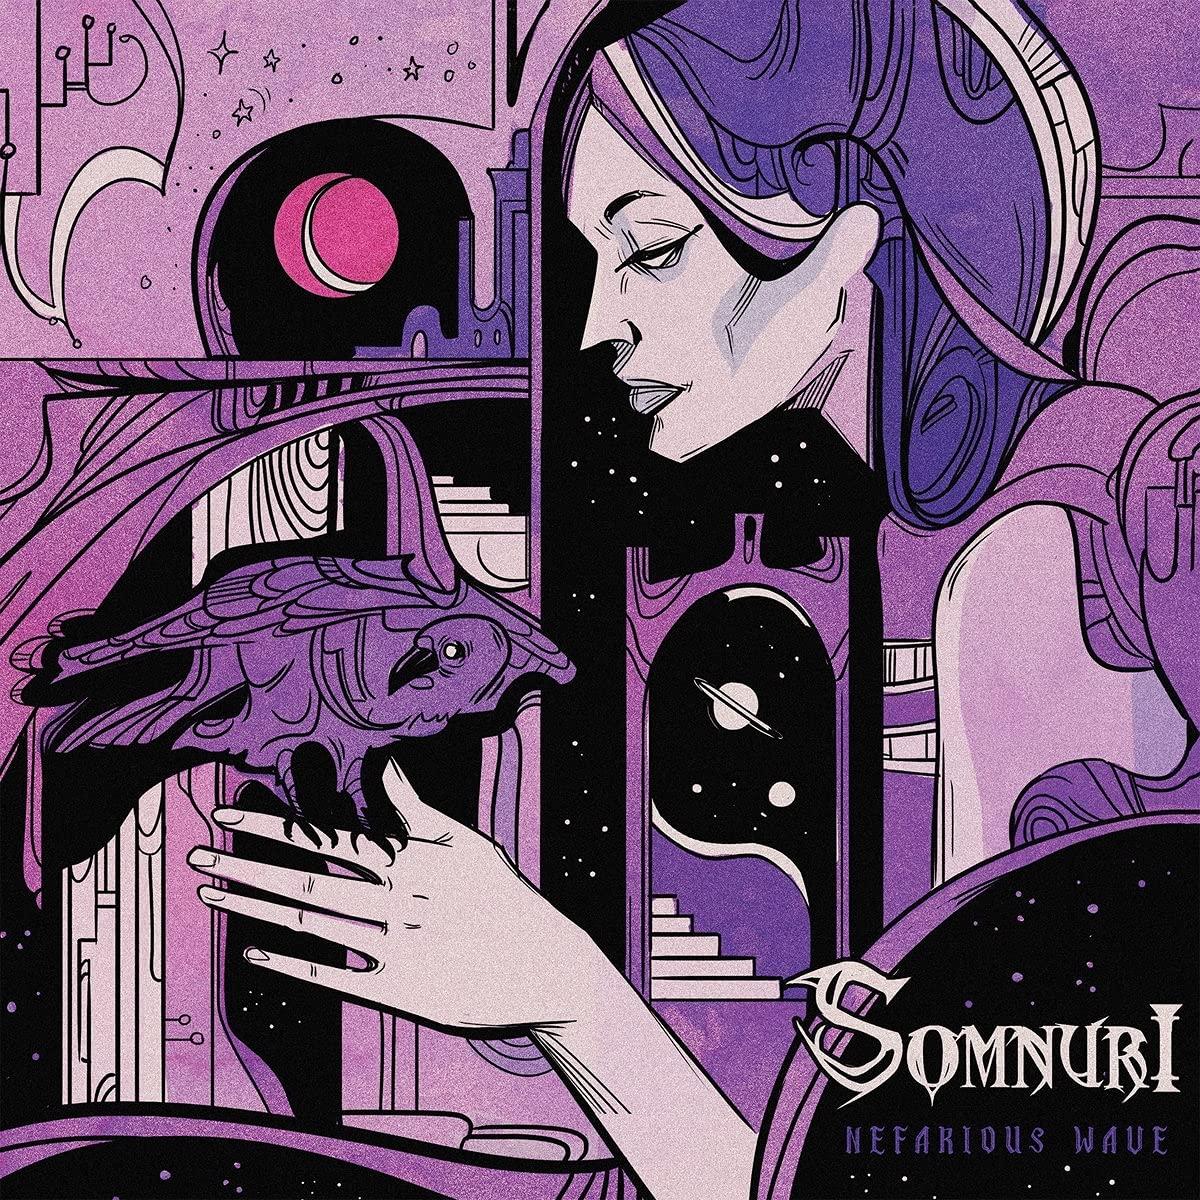 Somnuri - Nefarious Wave (2021) [FLAC] Download